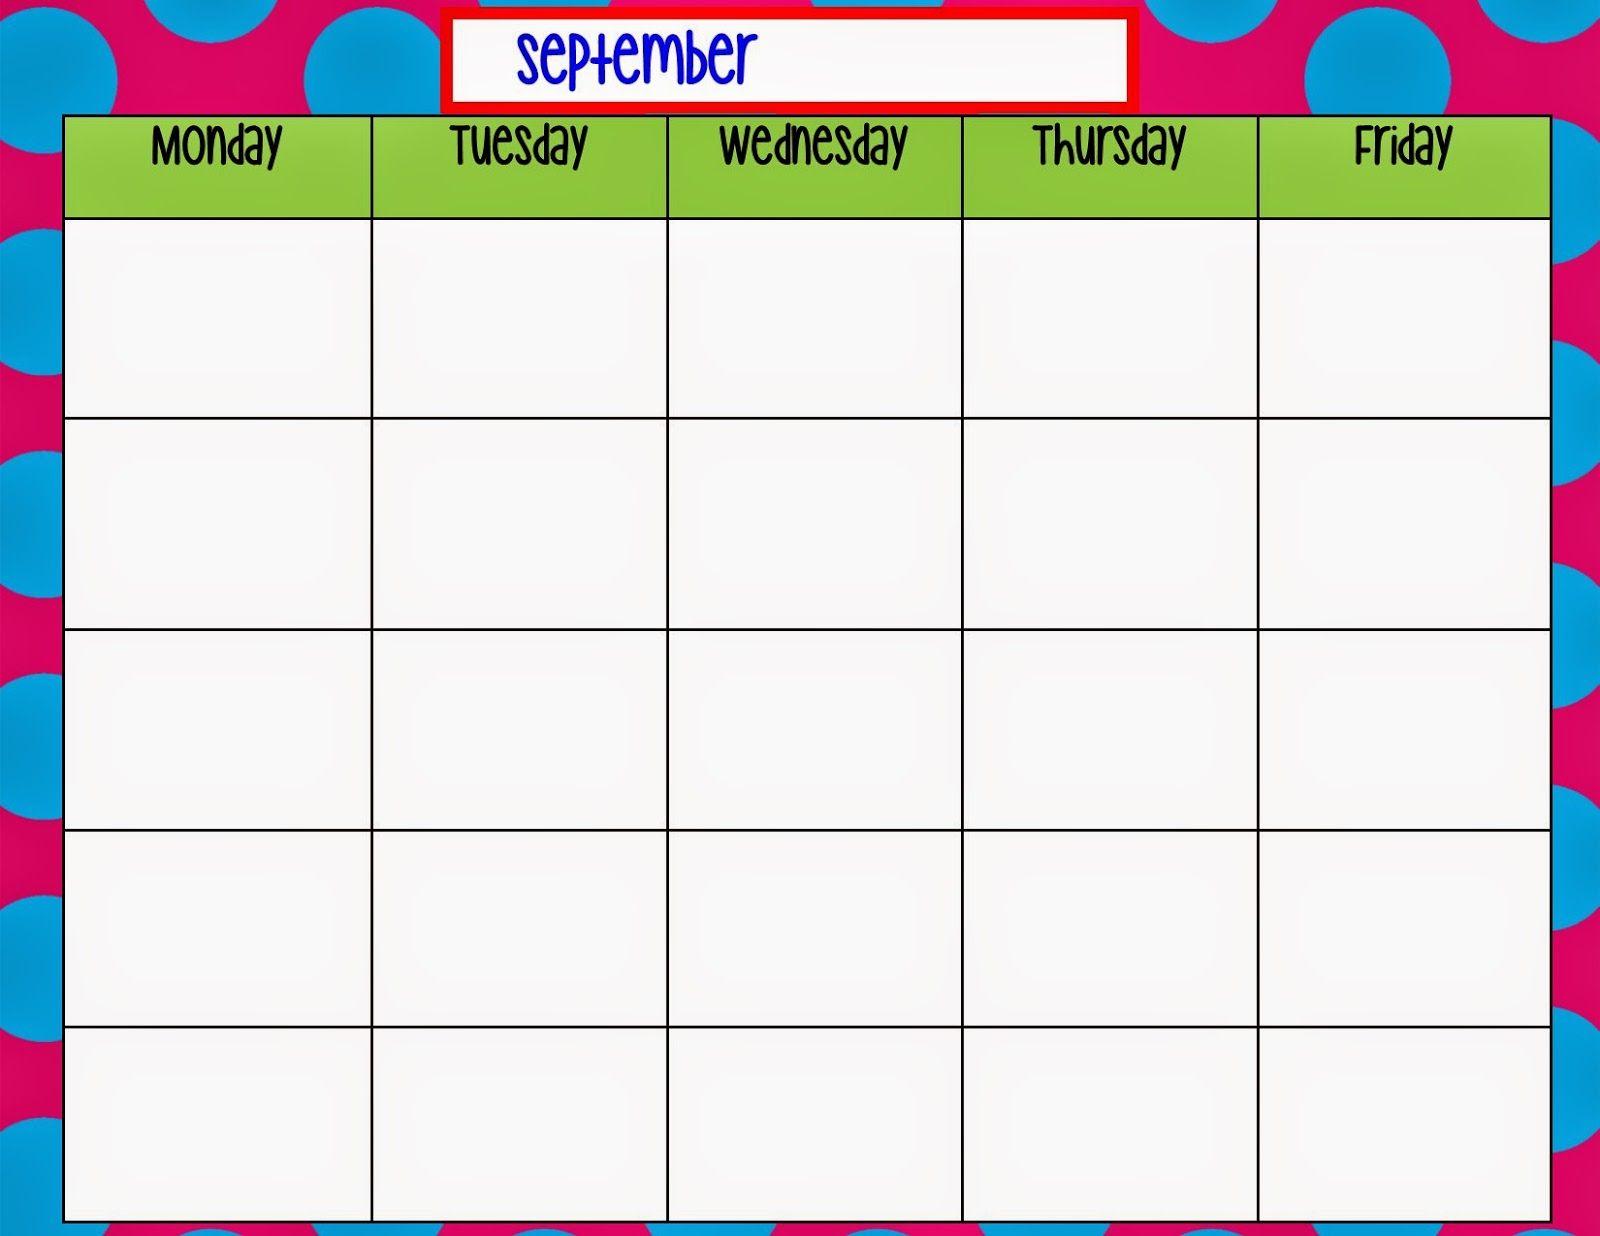 Monday Through Friday Calendar Template | Weekly Calendar within Monday Thru Friday Schedule Template